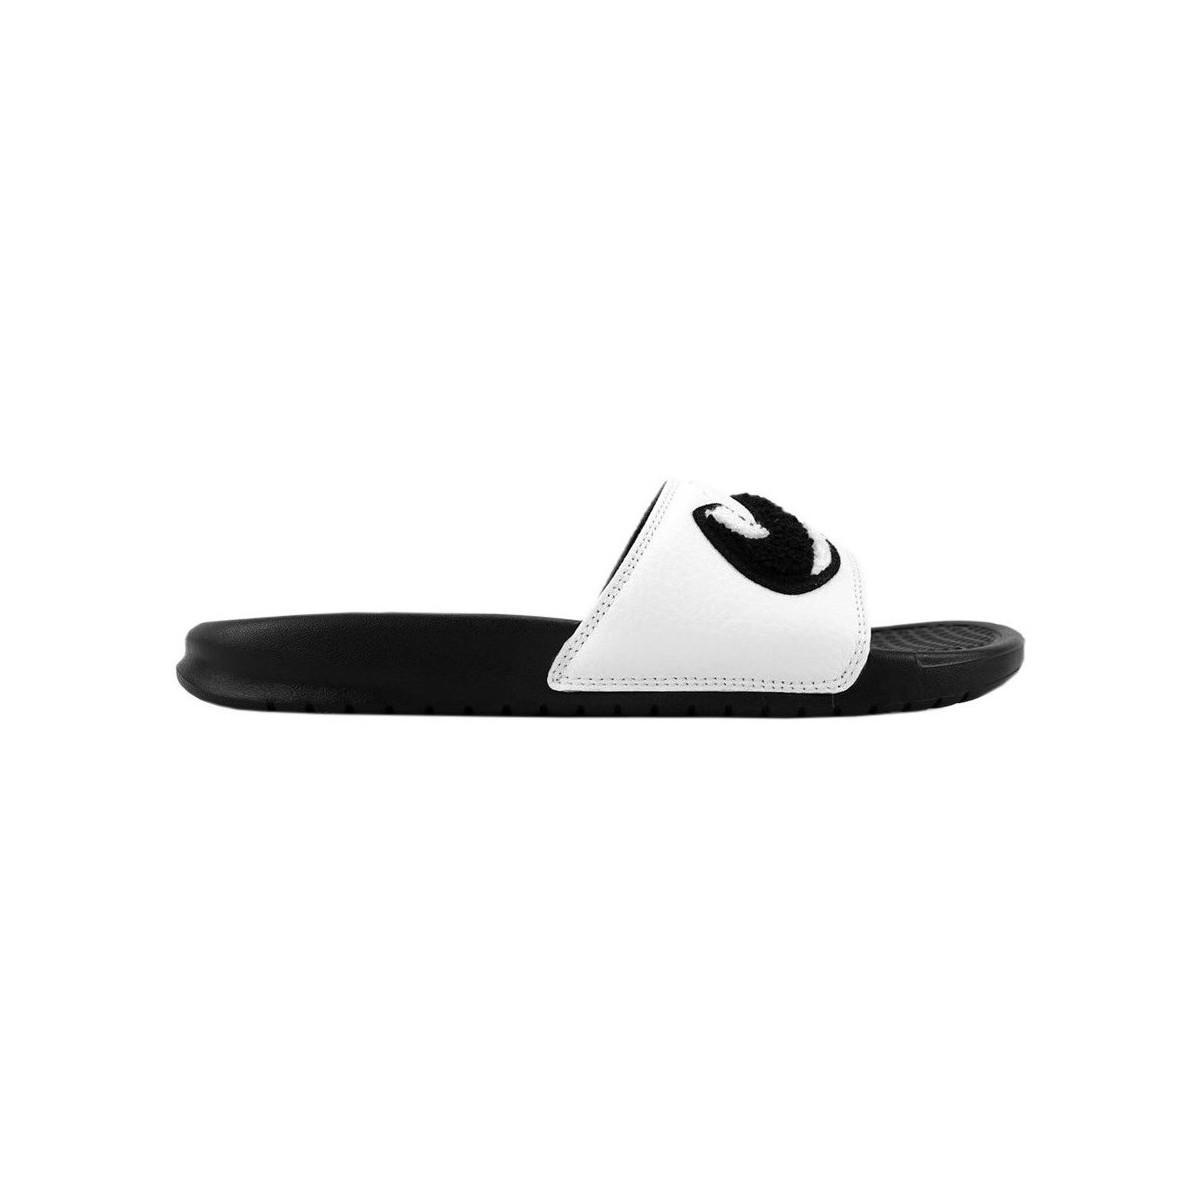 2aa4faacba64 Nike Benassi Just Do It Men s In Multicolour in Black for Men - Lyst